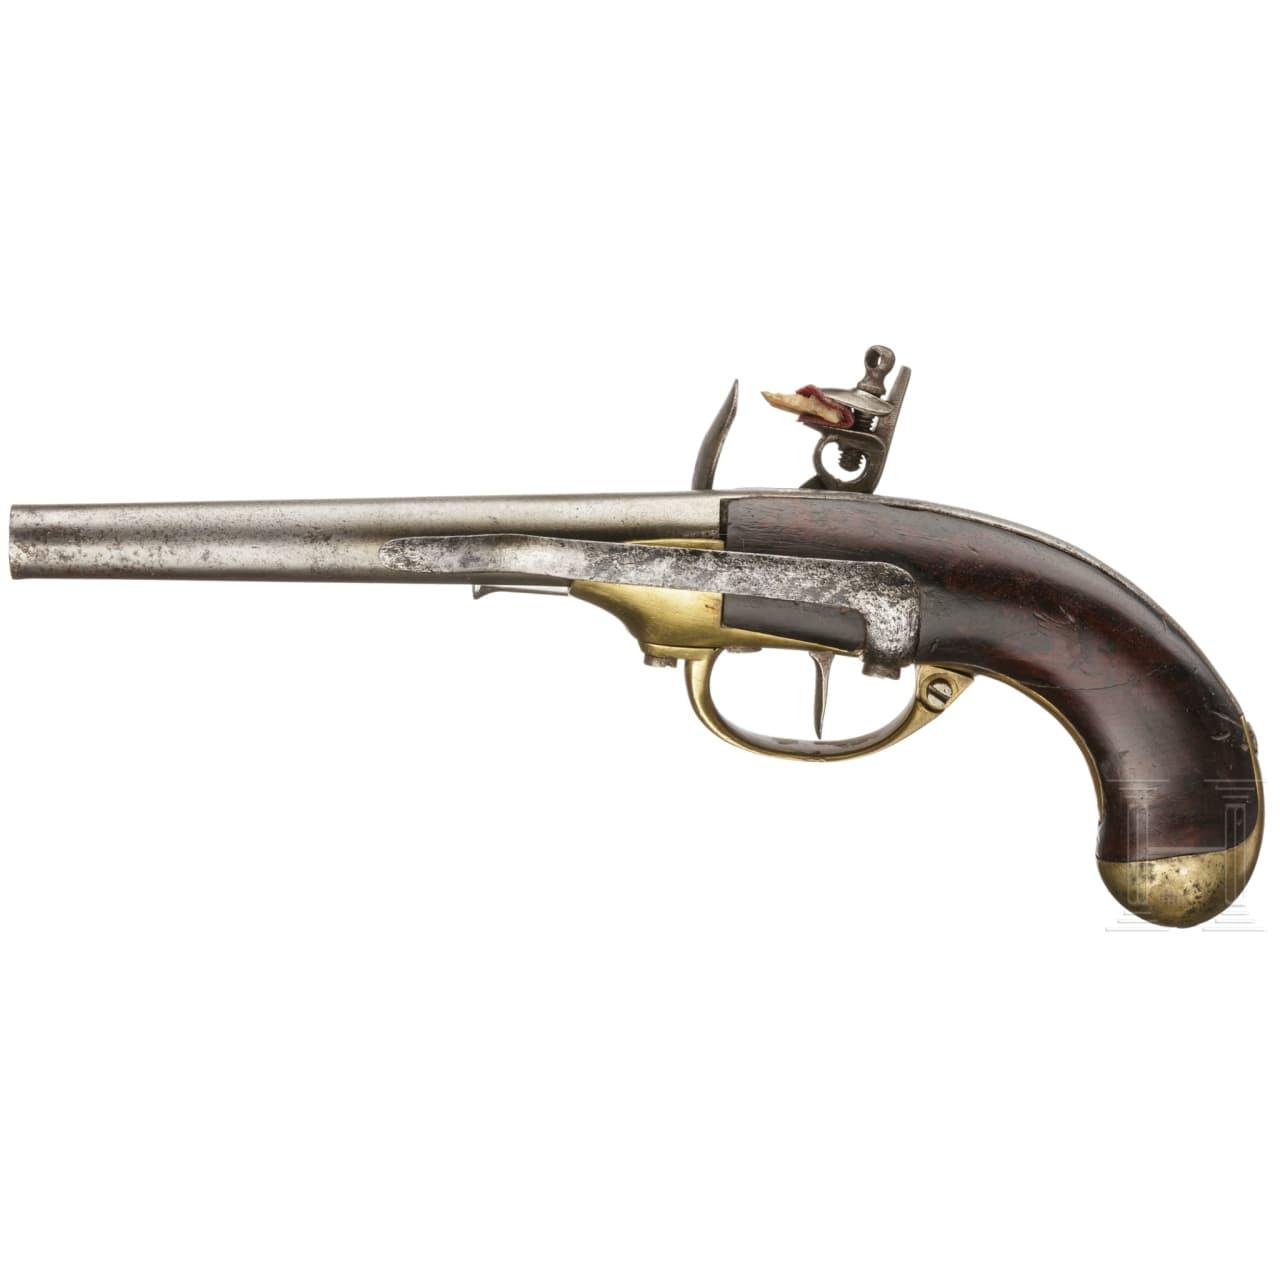 A French flintlock cavalry pistol, Mod. 1777 1st pattern, St. Etienne, circa 1780